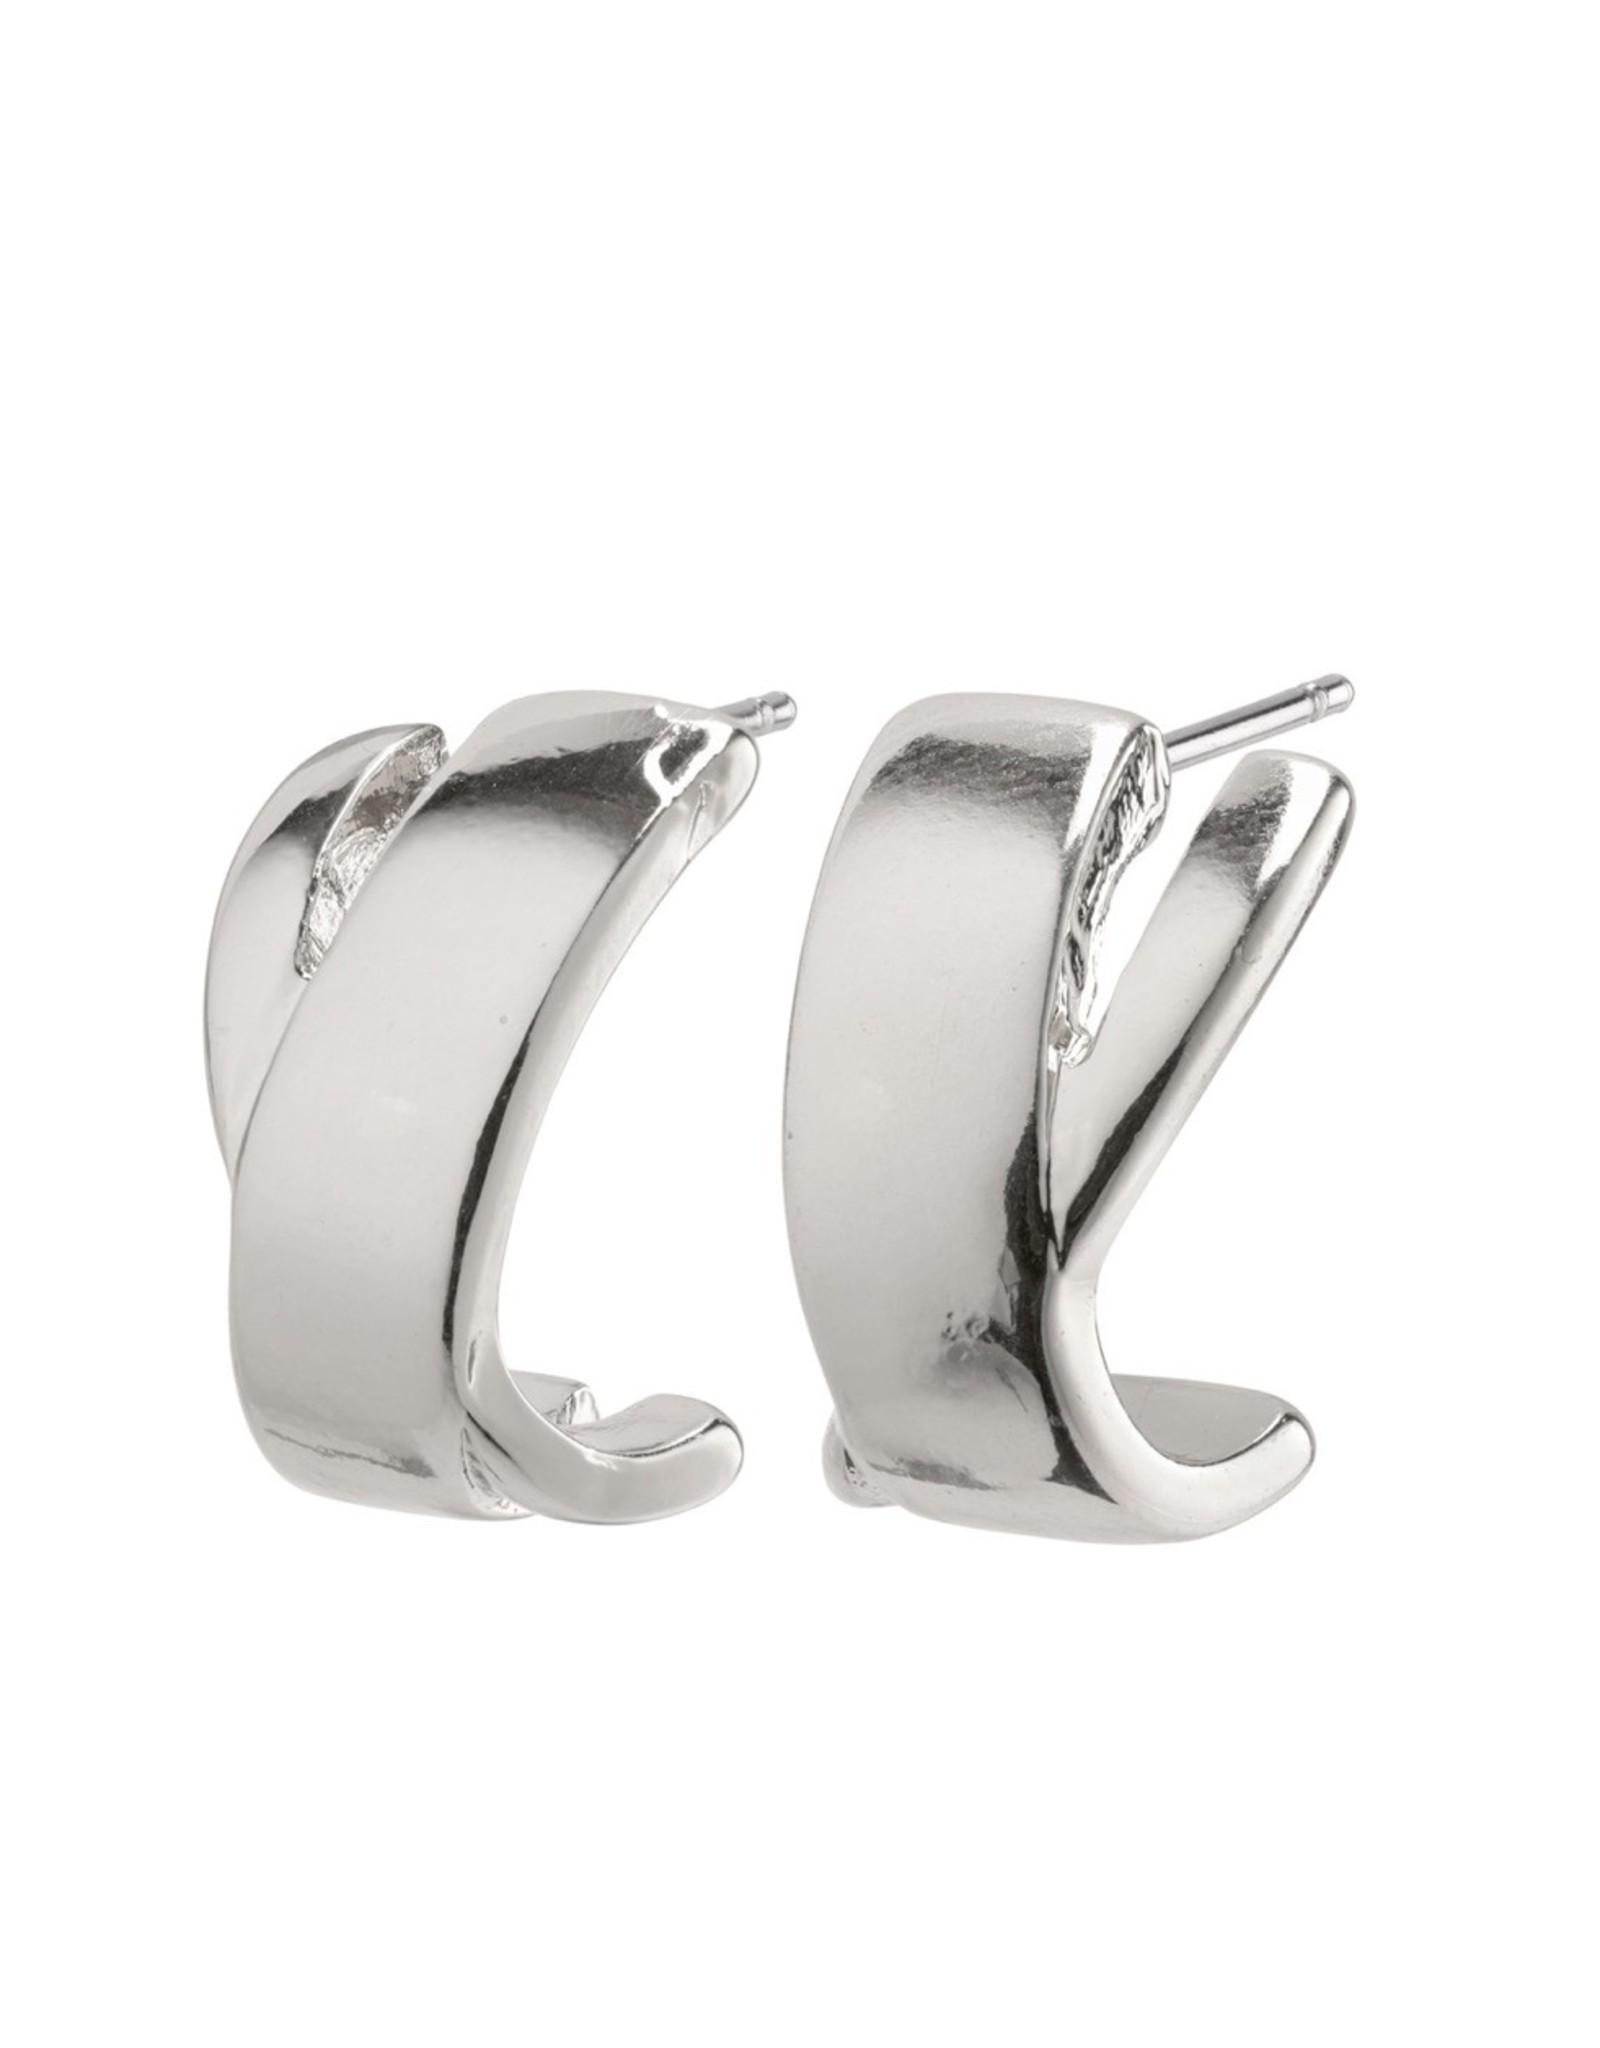 Pilgrim Pilgrim Earrings, Melia, Silver Plated